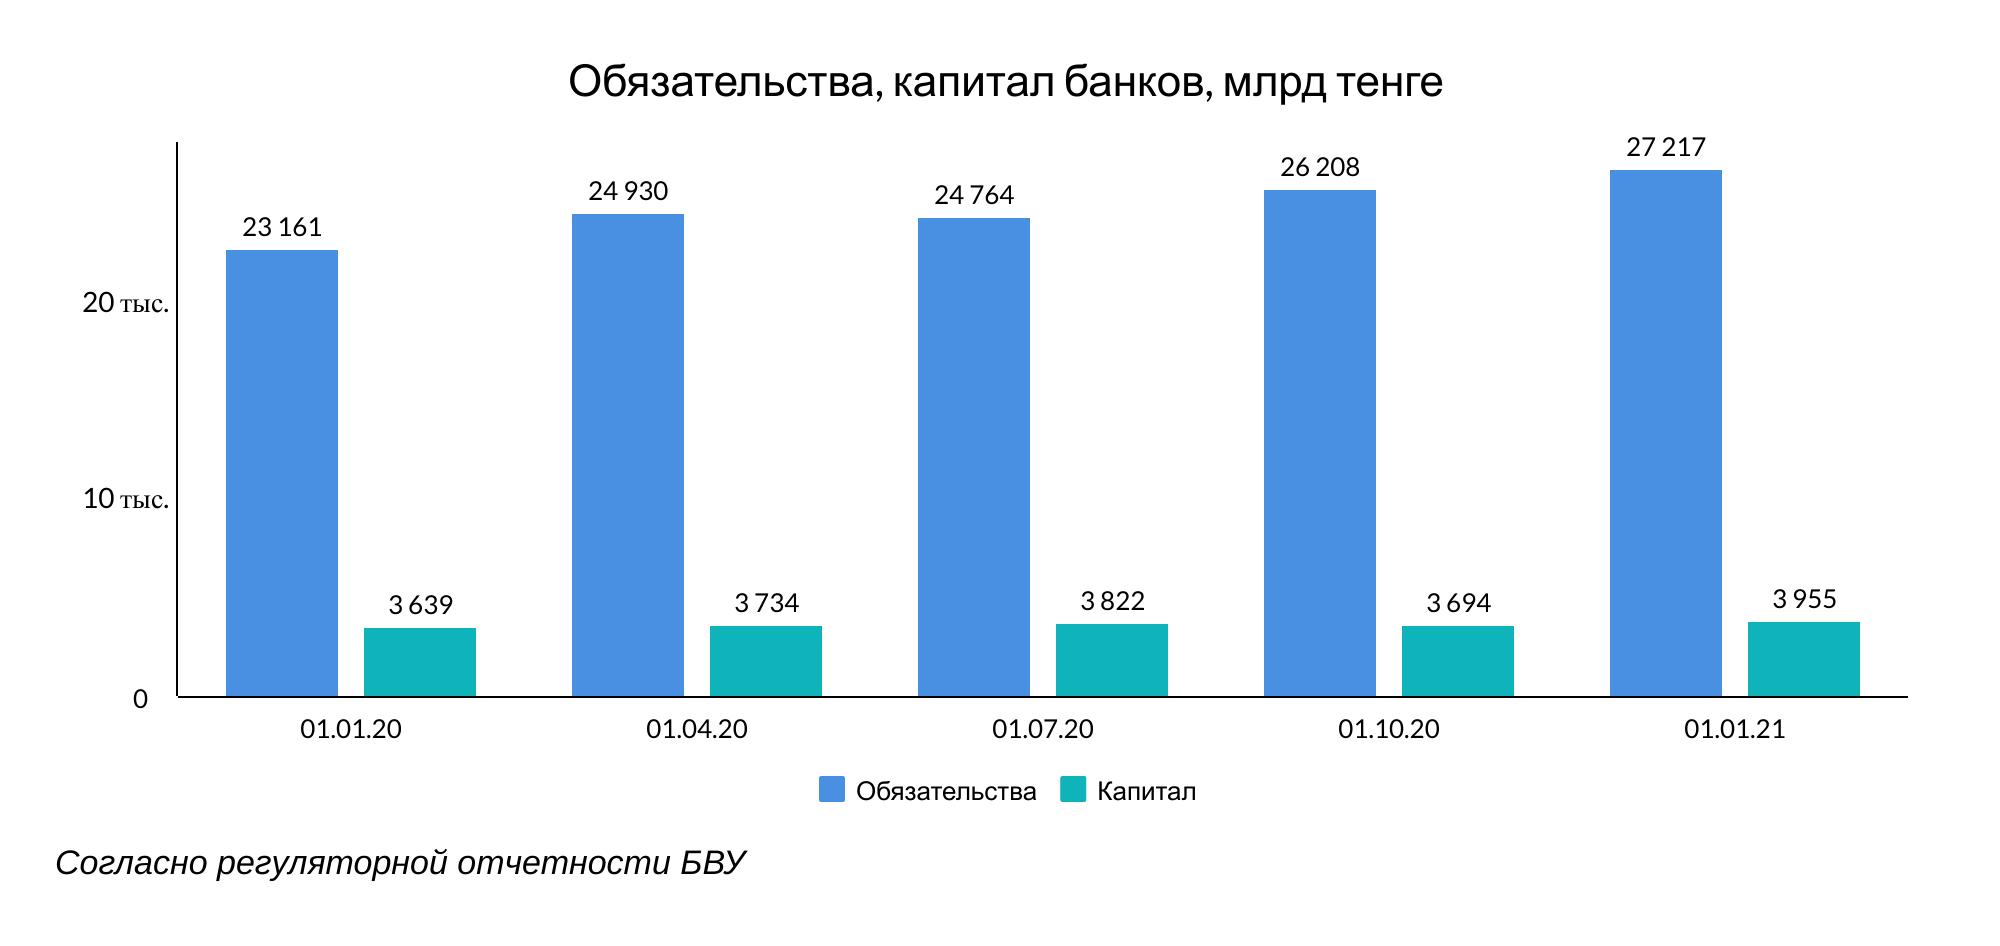 Банки Казахстана продолжают наращивать запасы ликвидности 595663 - Kapital.kz